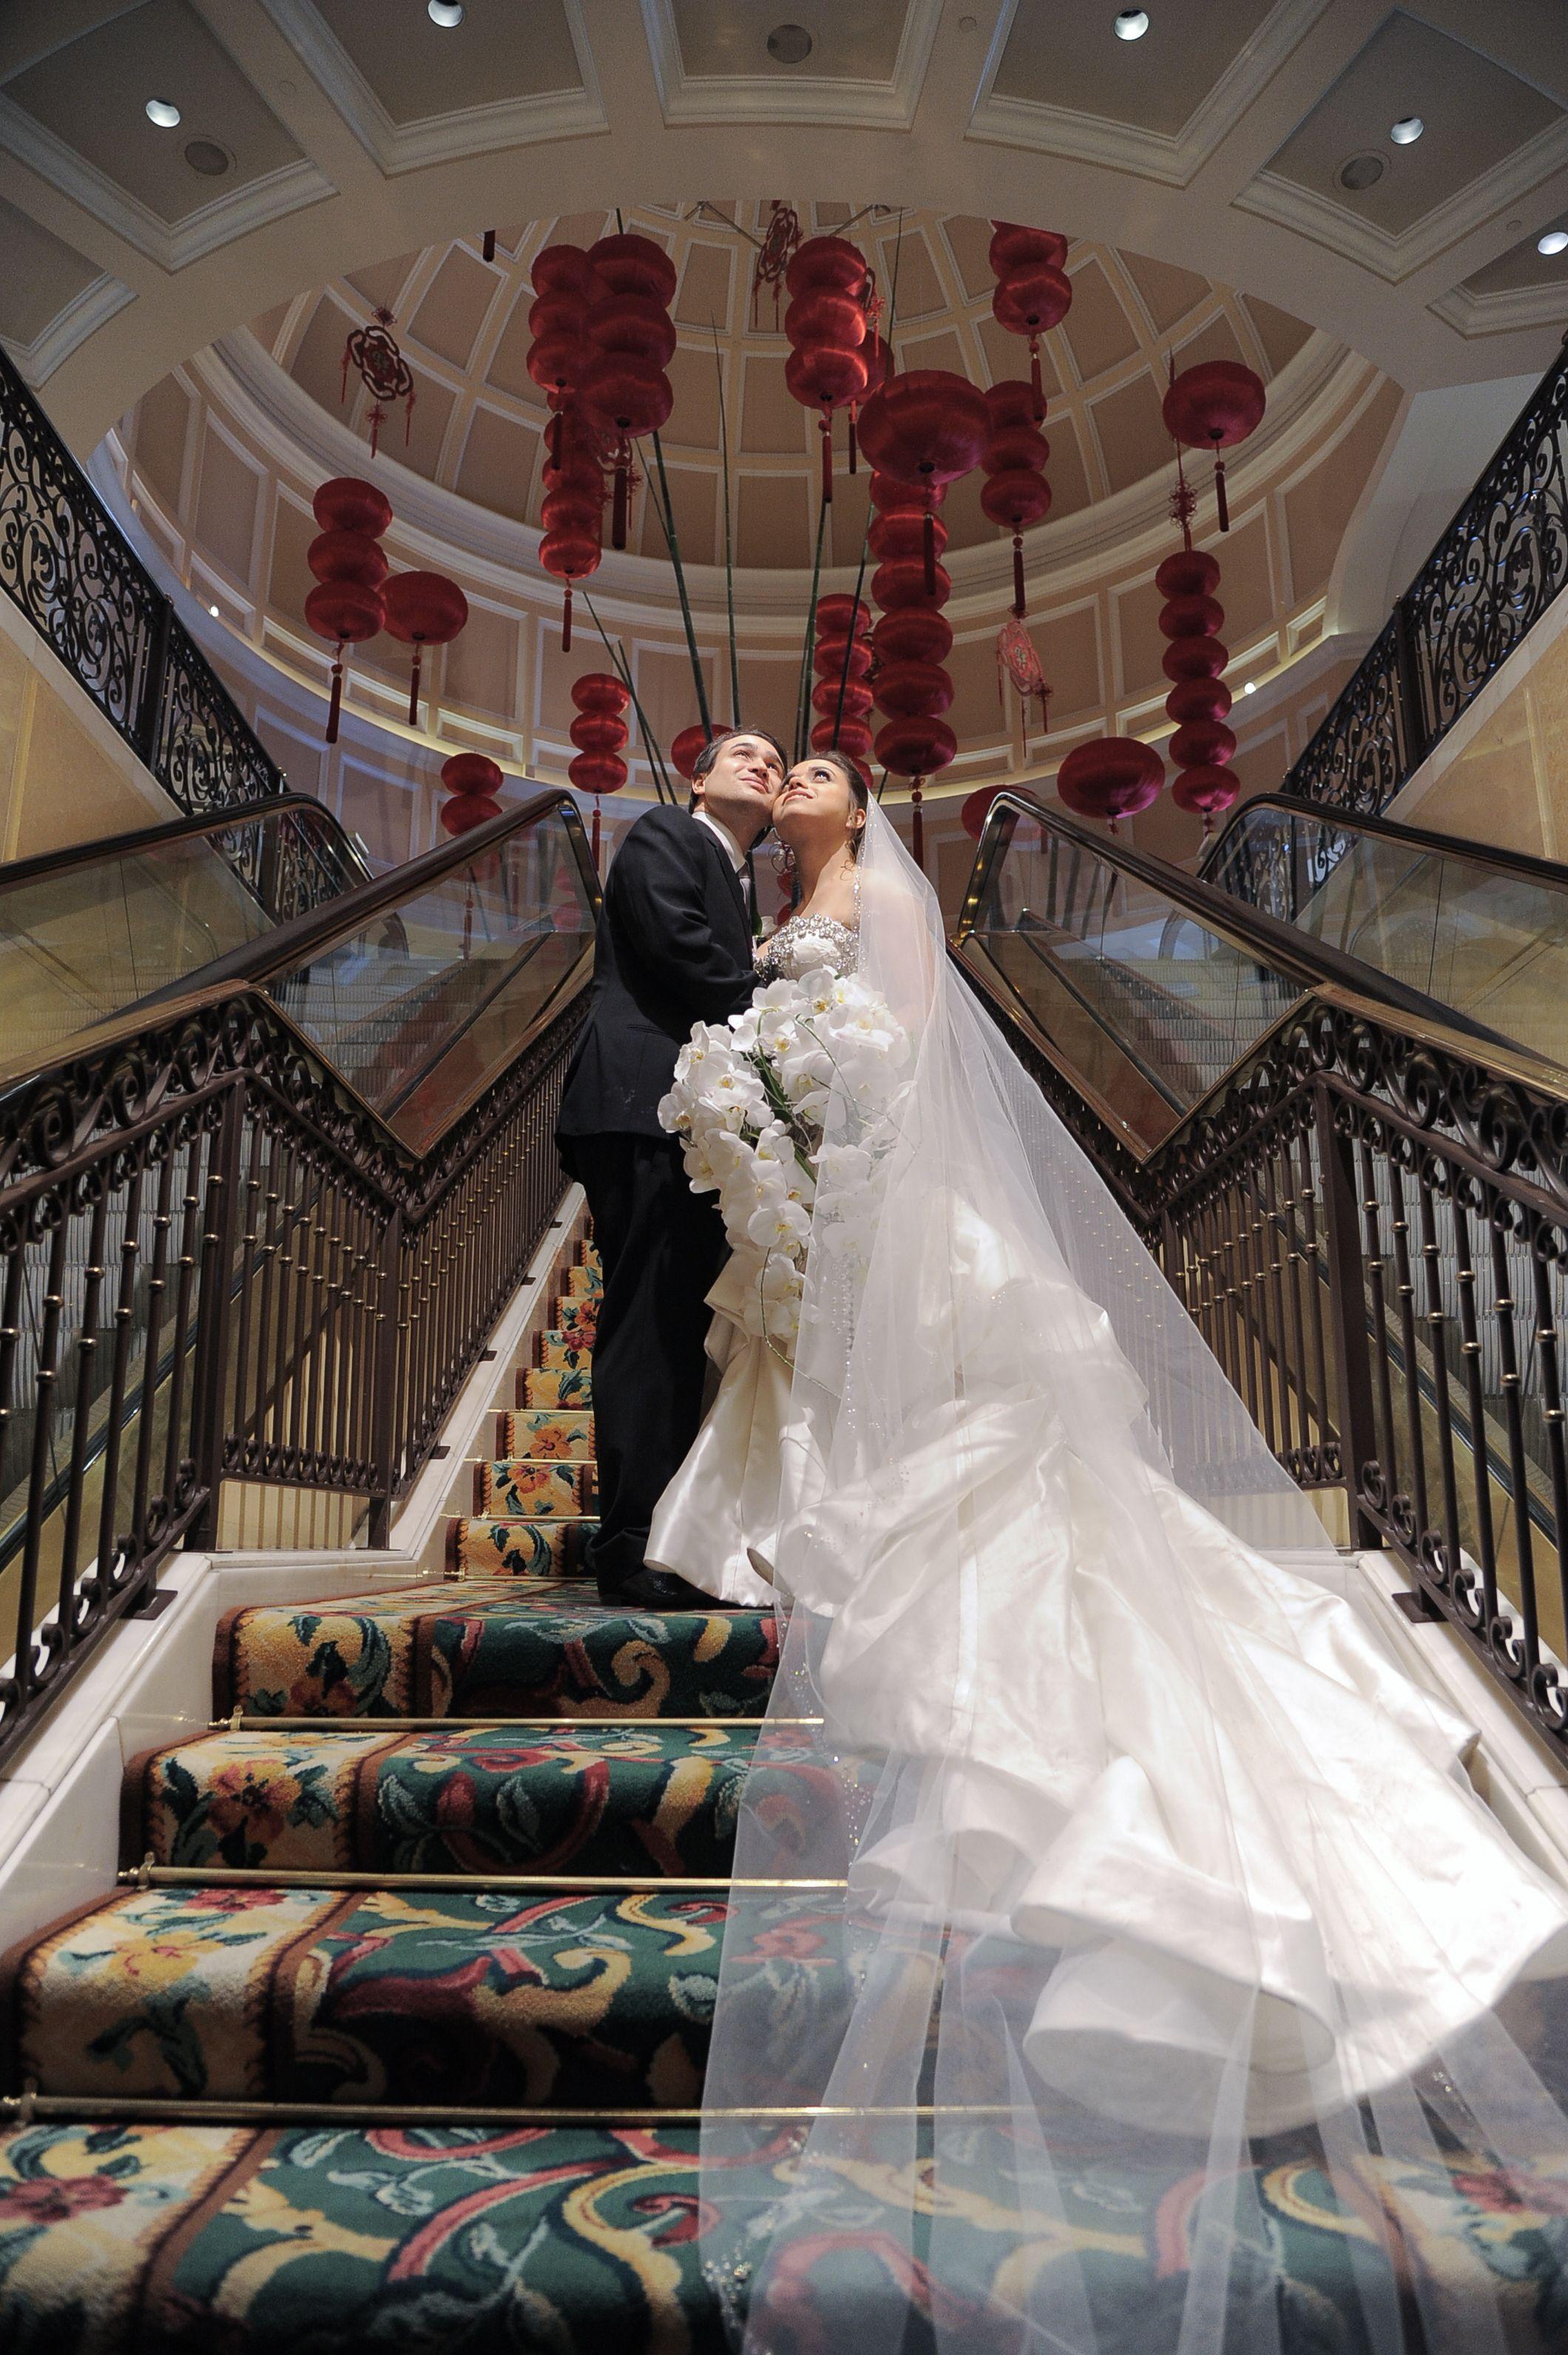 Looking Forward To A Bright Future Bellagioweddings Vegaswedding